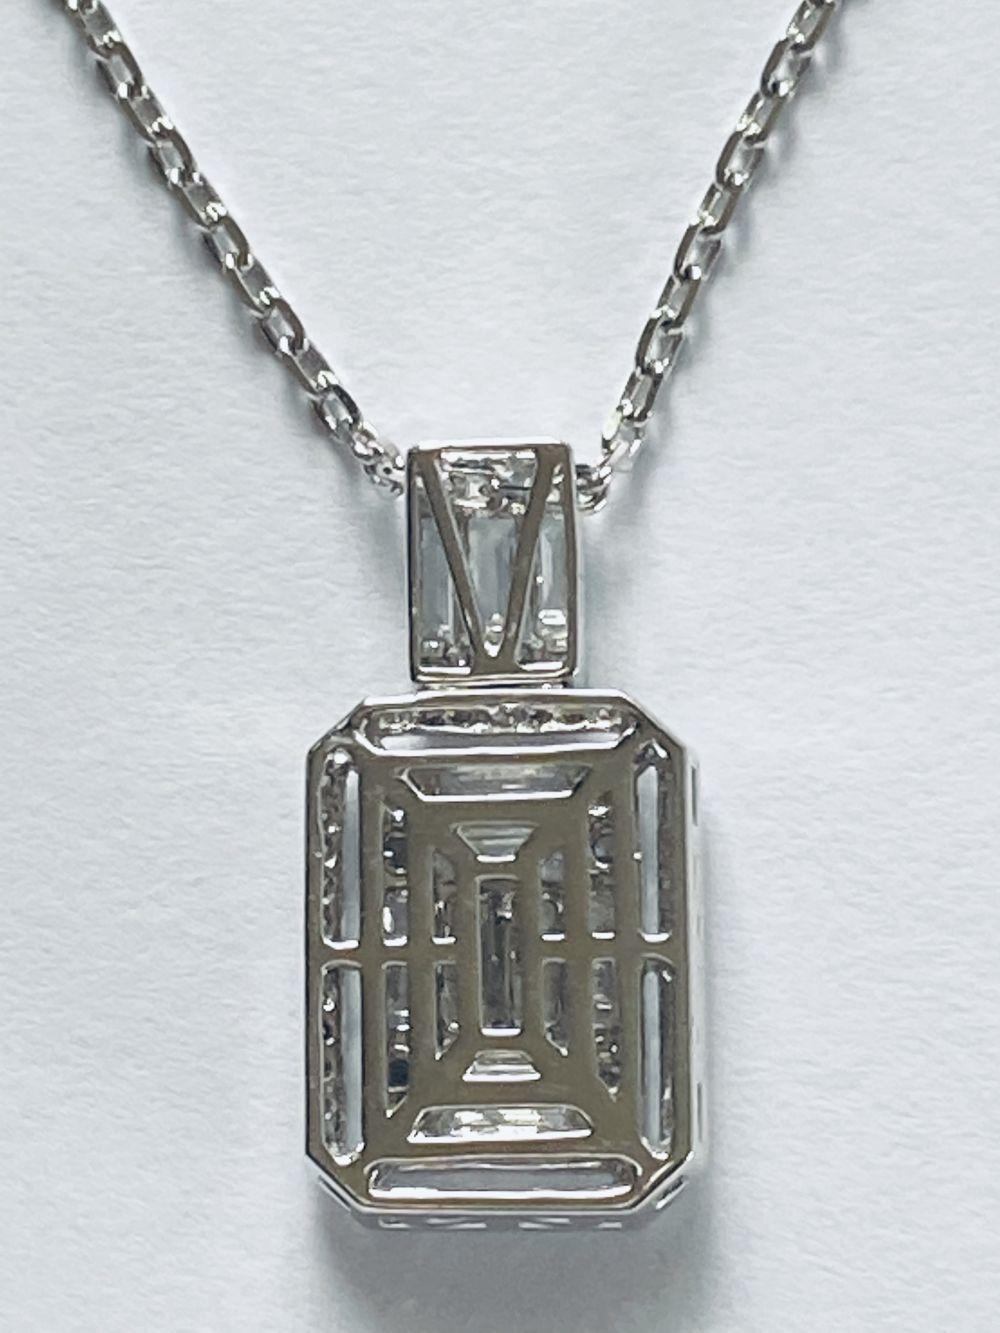 18CT WHITE GOLD DIAMOND BAGUETTE PENDANT - Image 3 of 3